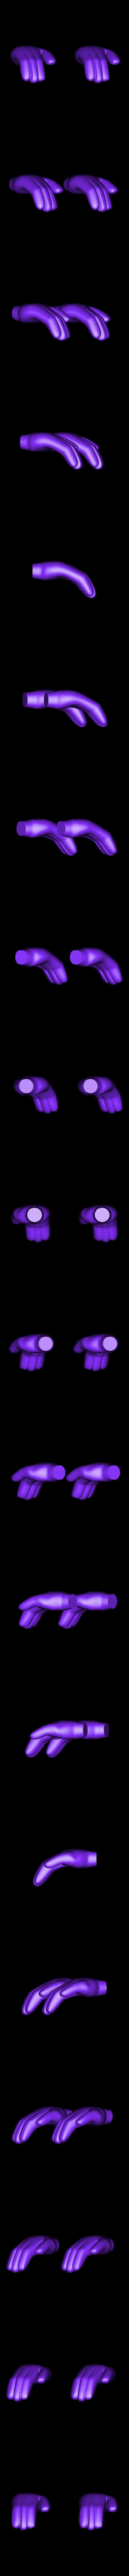 hands_right.stl Download free STL file The Caterpillar • 3D print model, reddadsteve